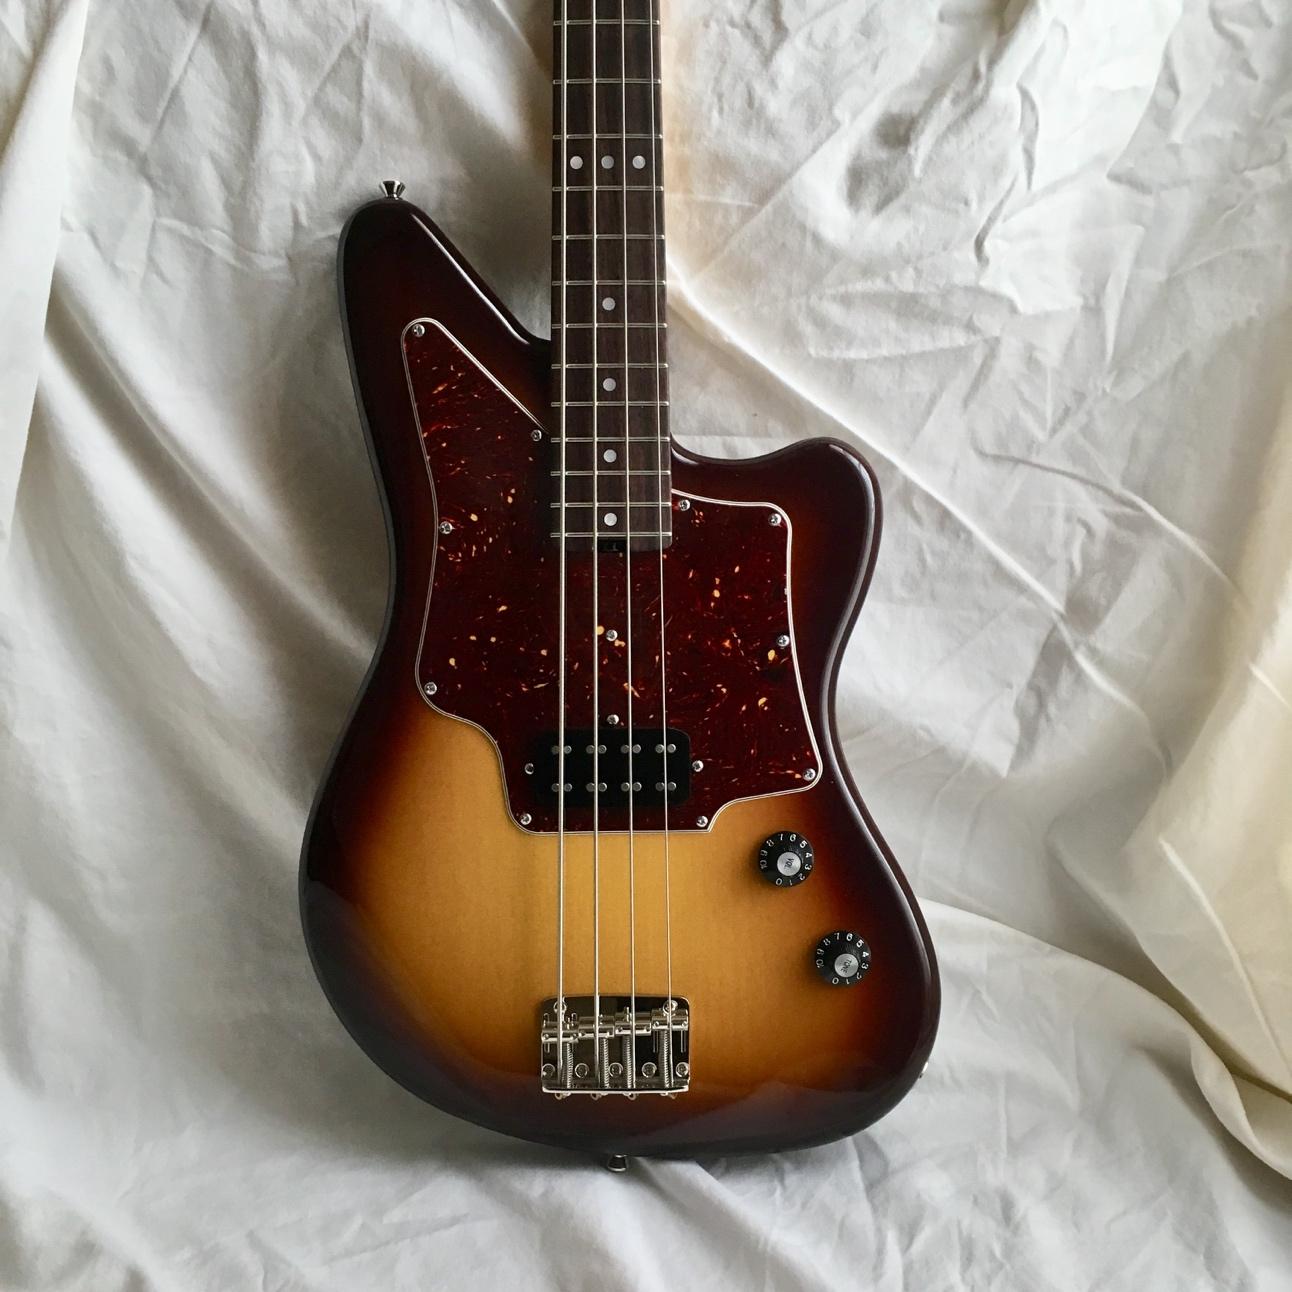 Swope Bass Body